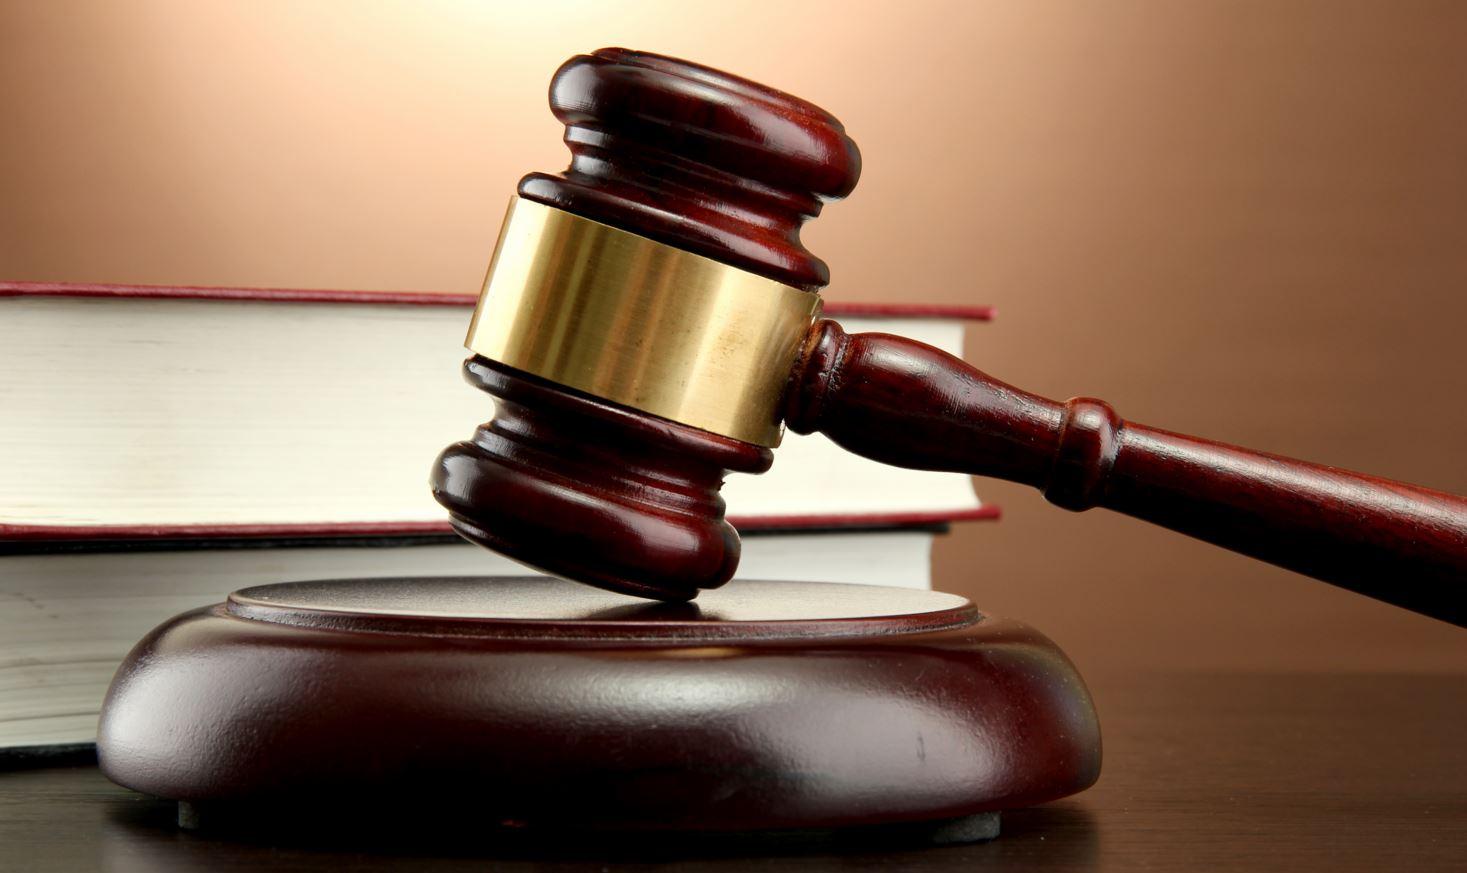 apple-53-legal-lawsuit-pc-tablet-media